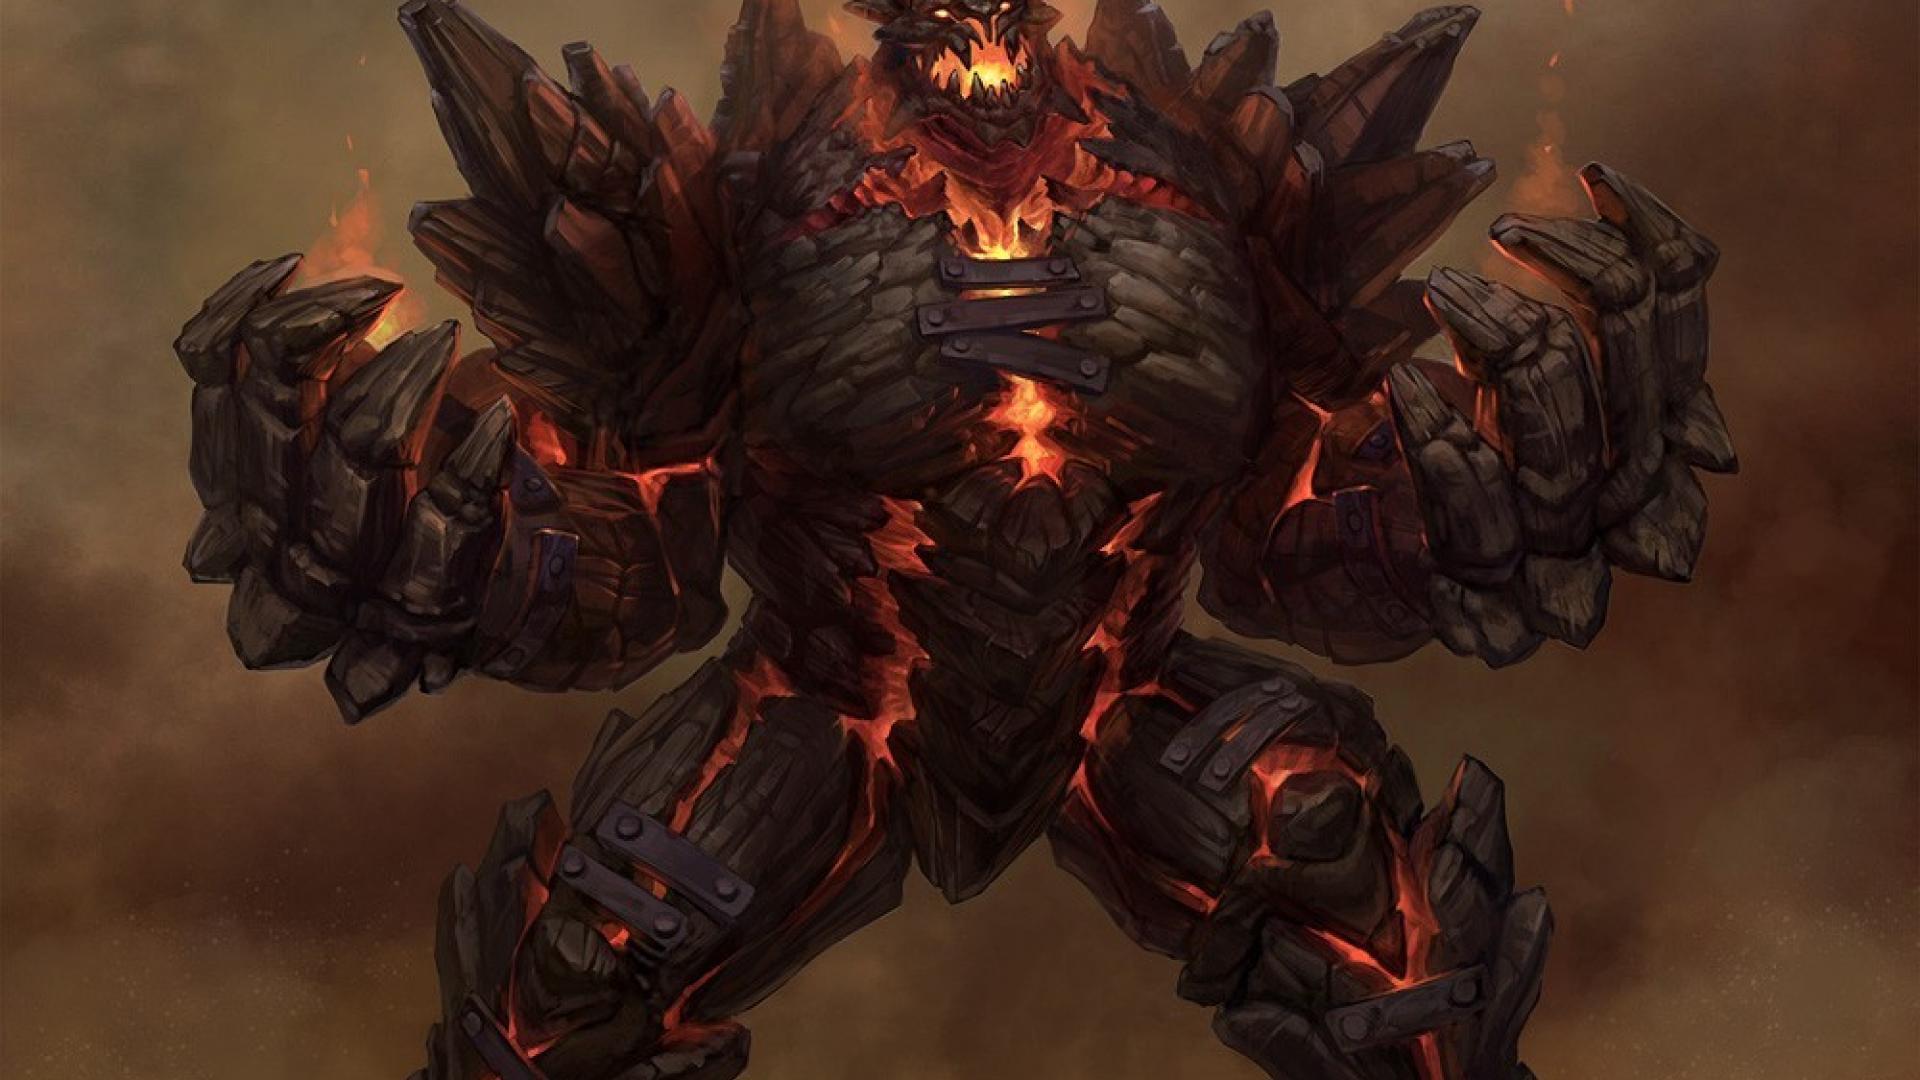 Monsters fire fantasy art golem wallpaper 125864 1920x1080